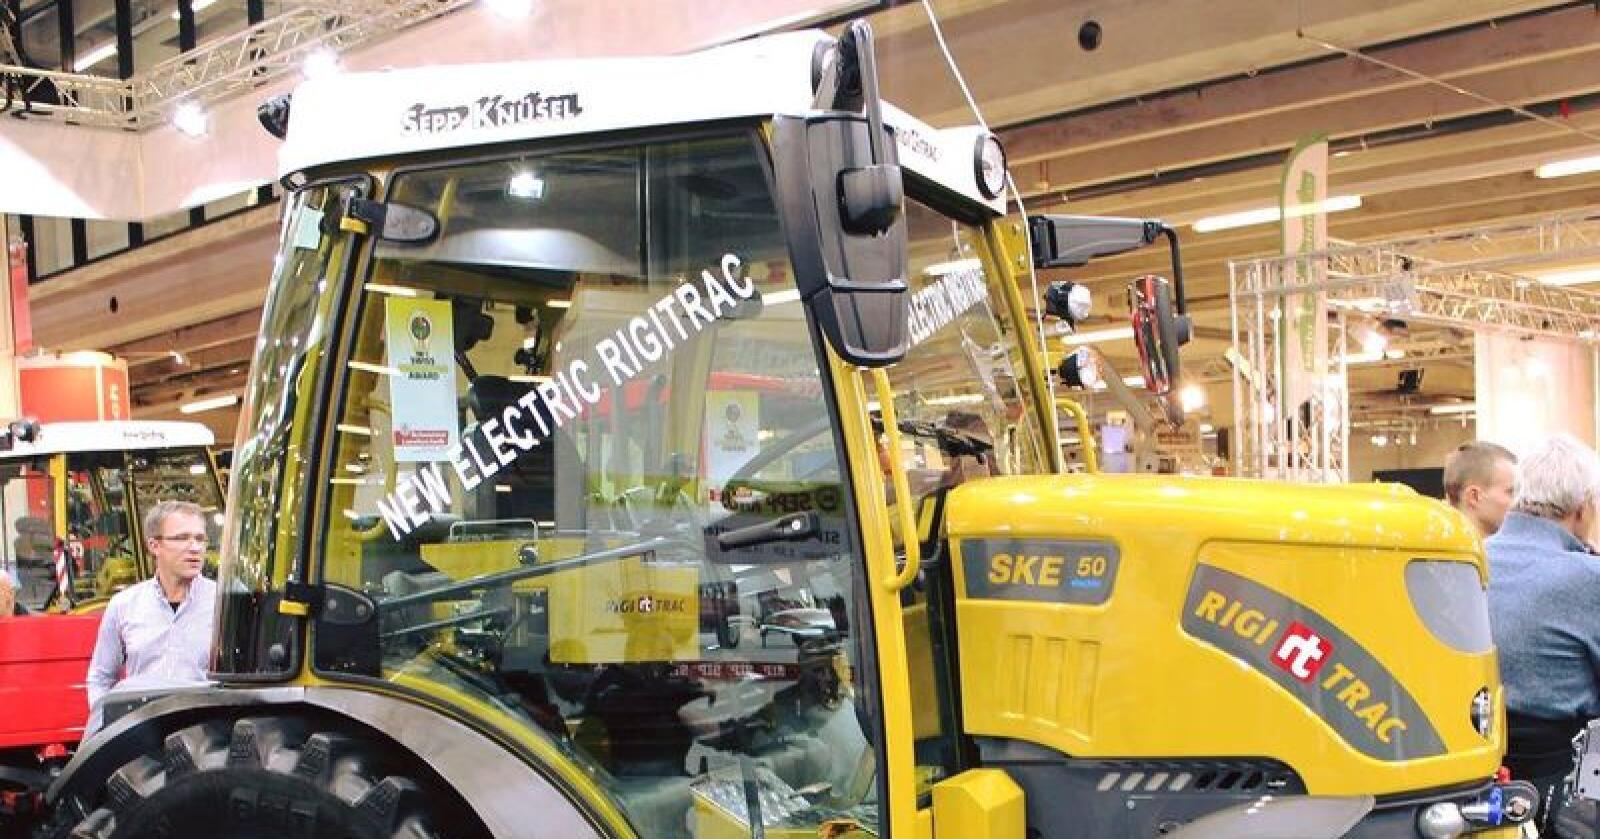 Elektrisk: Rigitrac SKE 50 Electric ble vist på landbruksmessa AGRAMA i Sveits. Det er batteriprodusenten Ecovolta som har publisert bildet på sin Facebook-side. Foto: Ecovolta